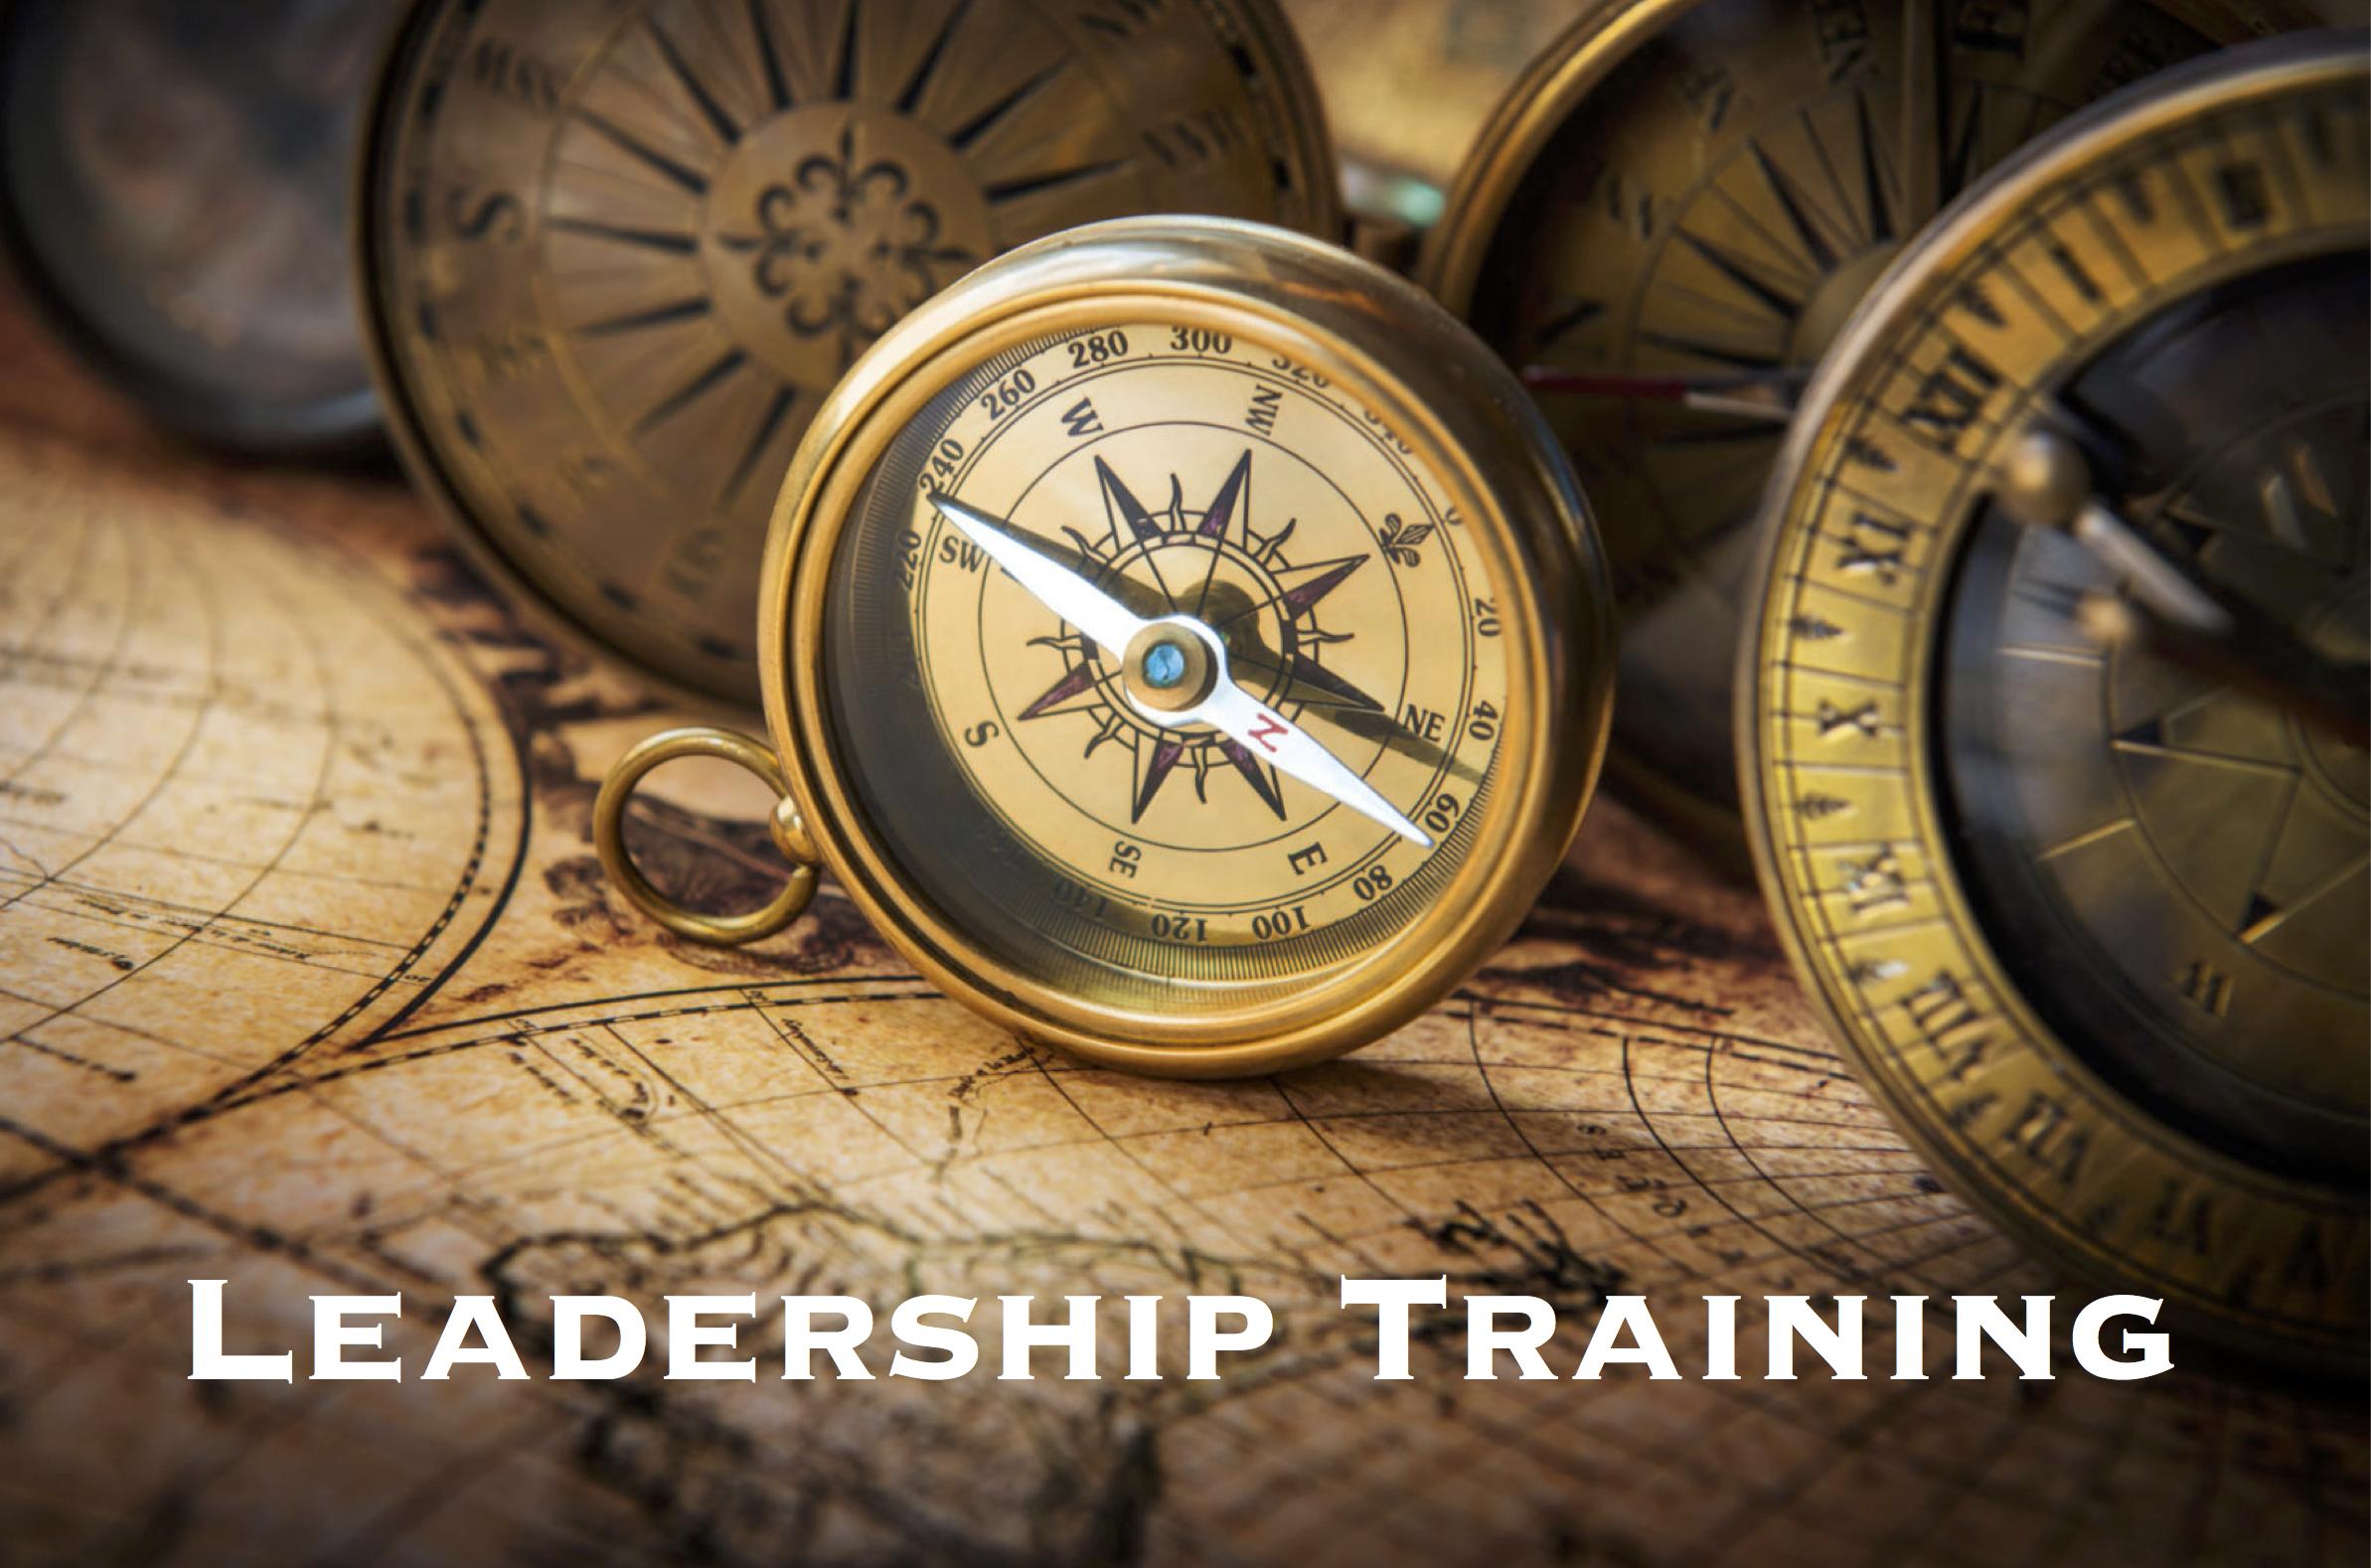 SS_MEME_LeadershipTraining.png